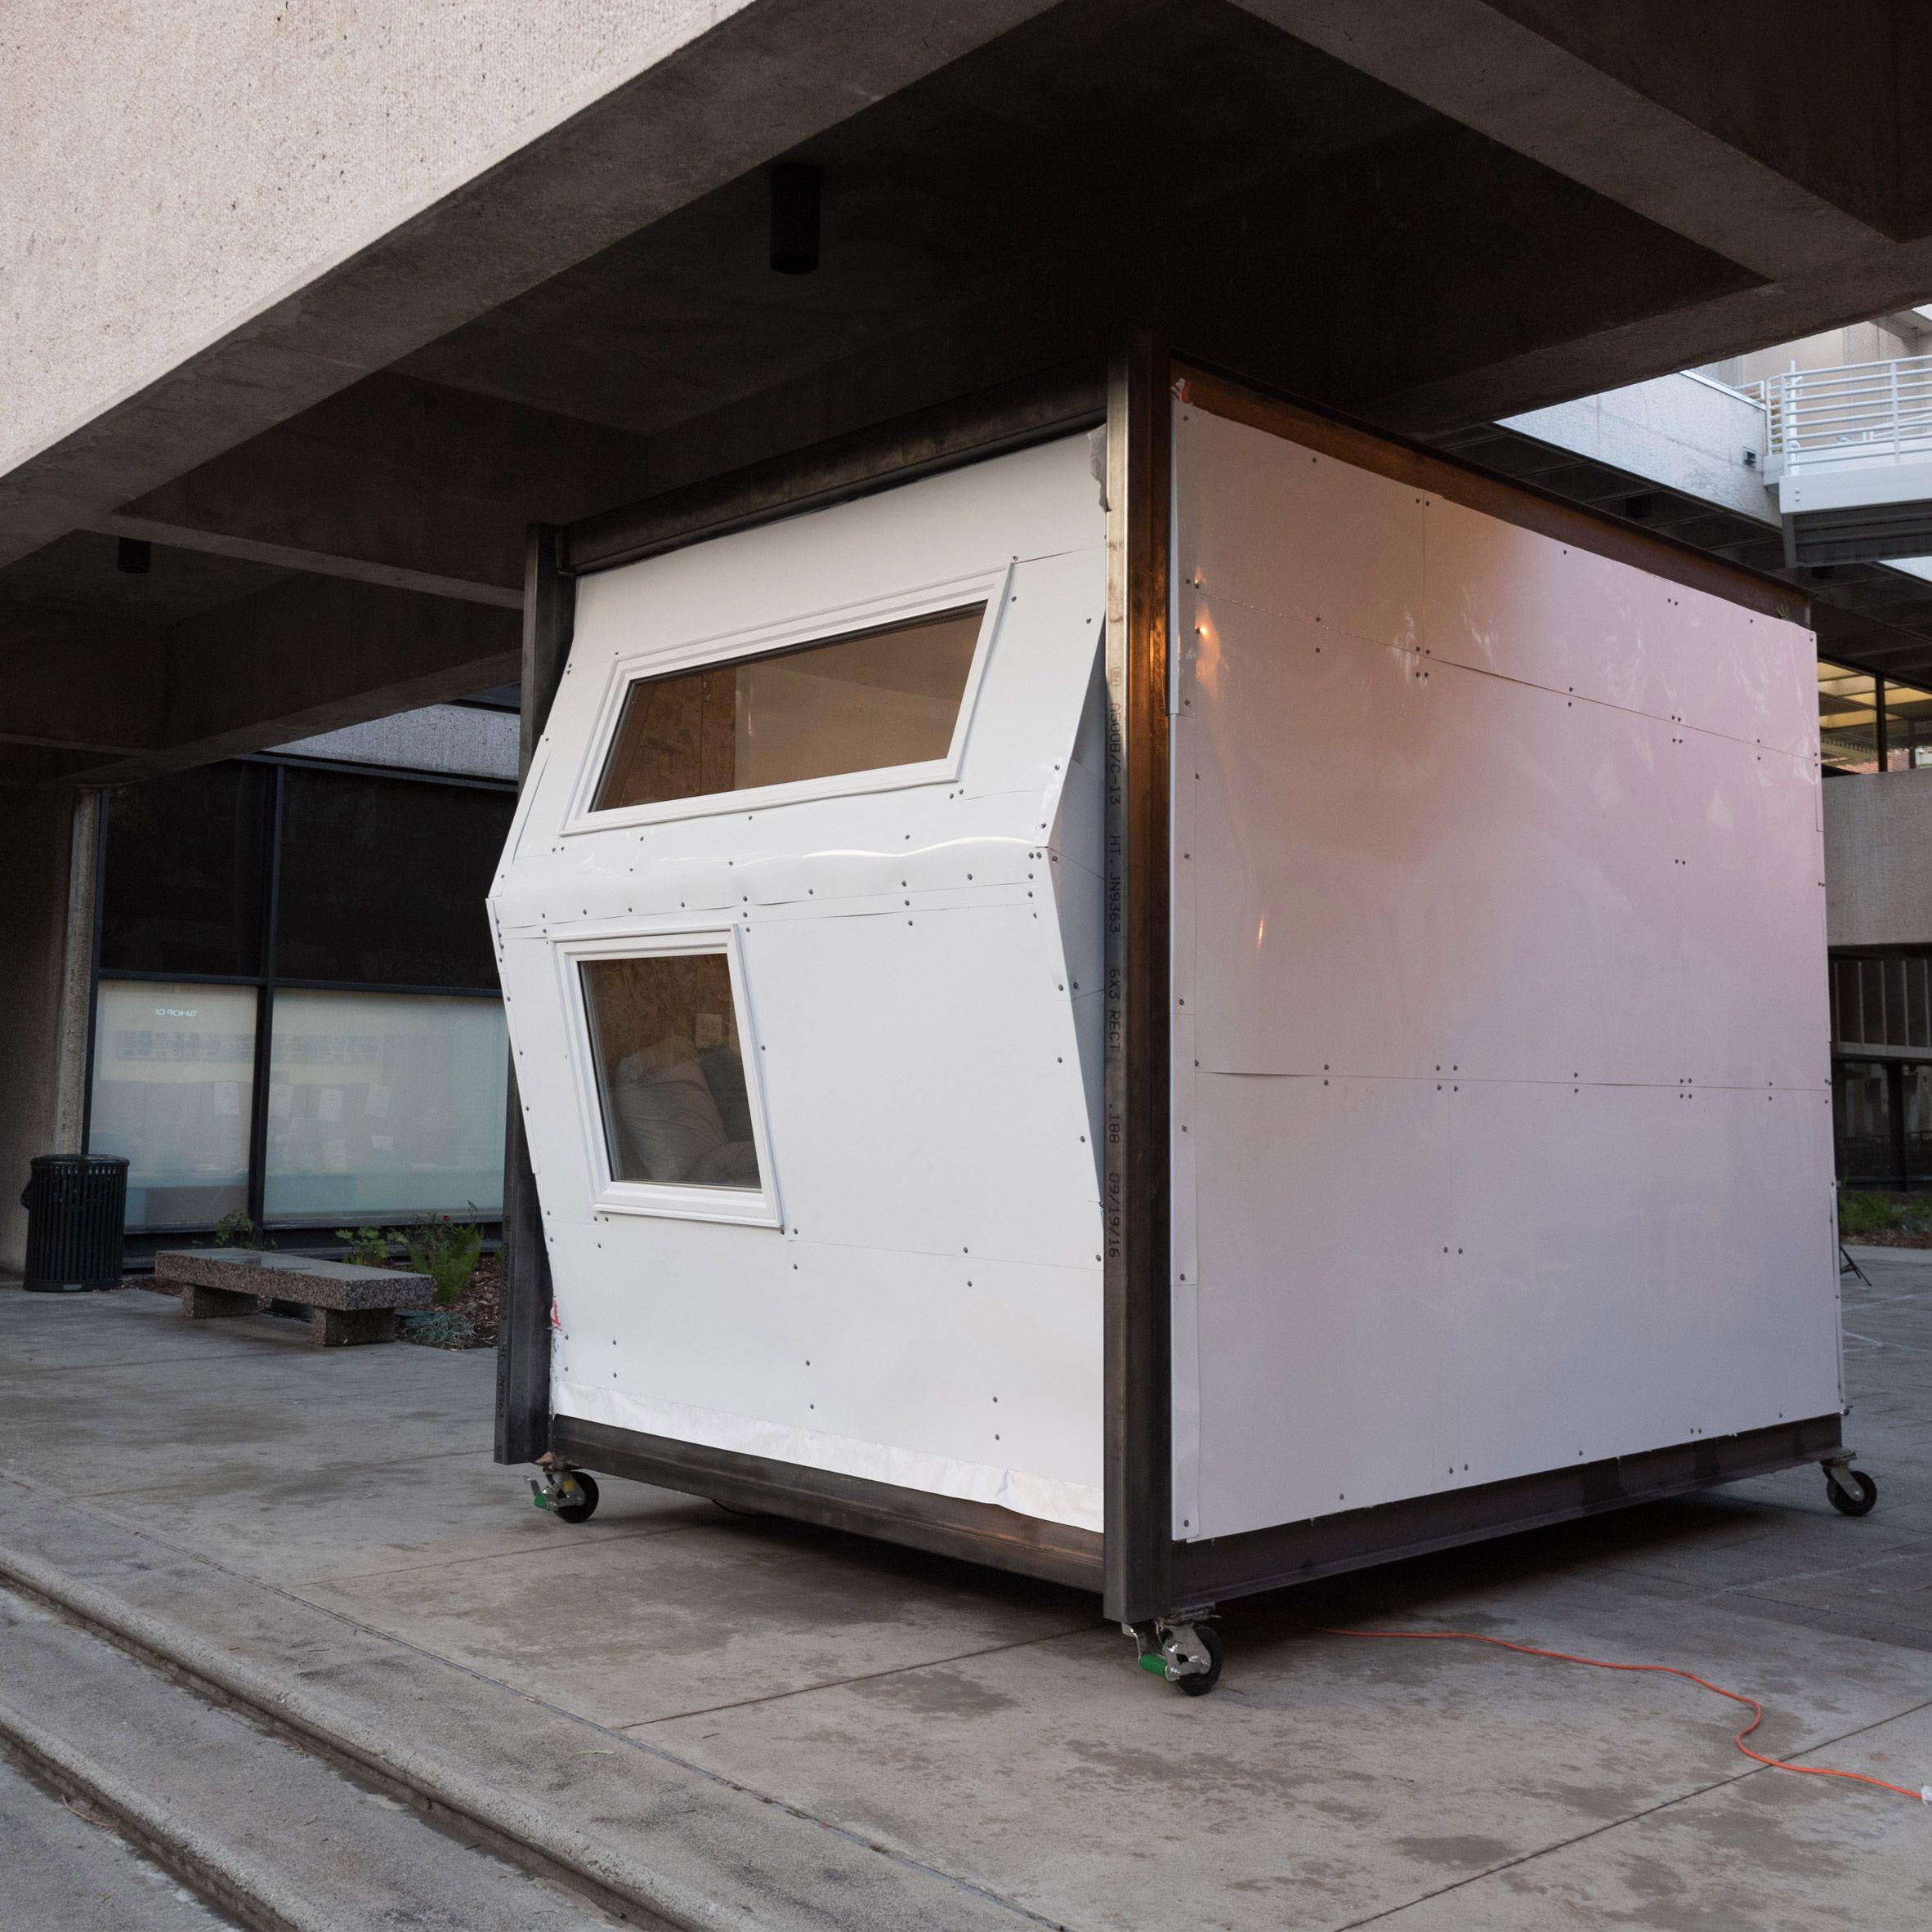 usc students have designed shelters for homeless people ranging rh br pinterest com